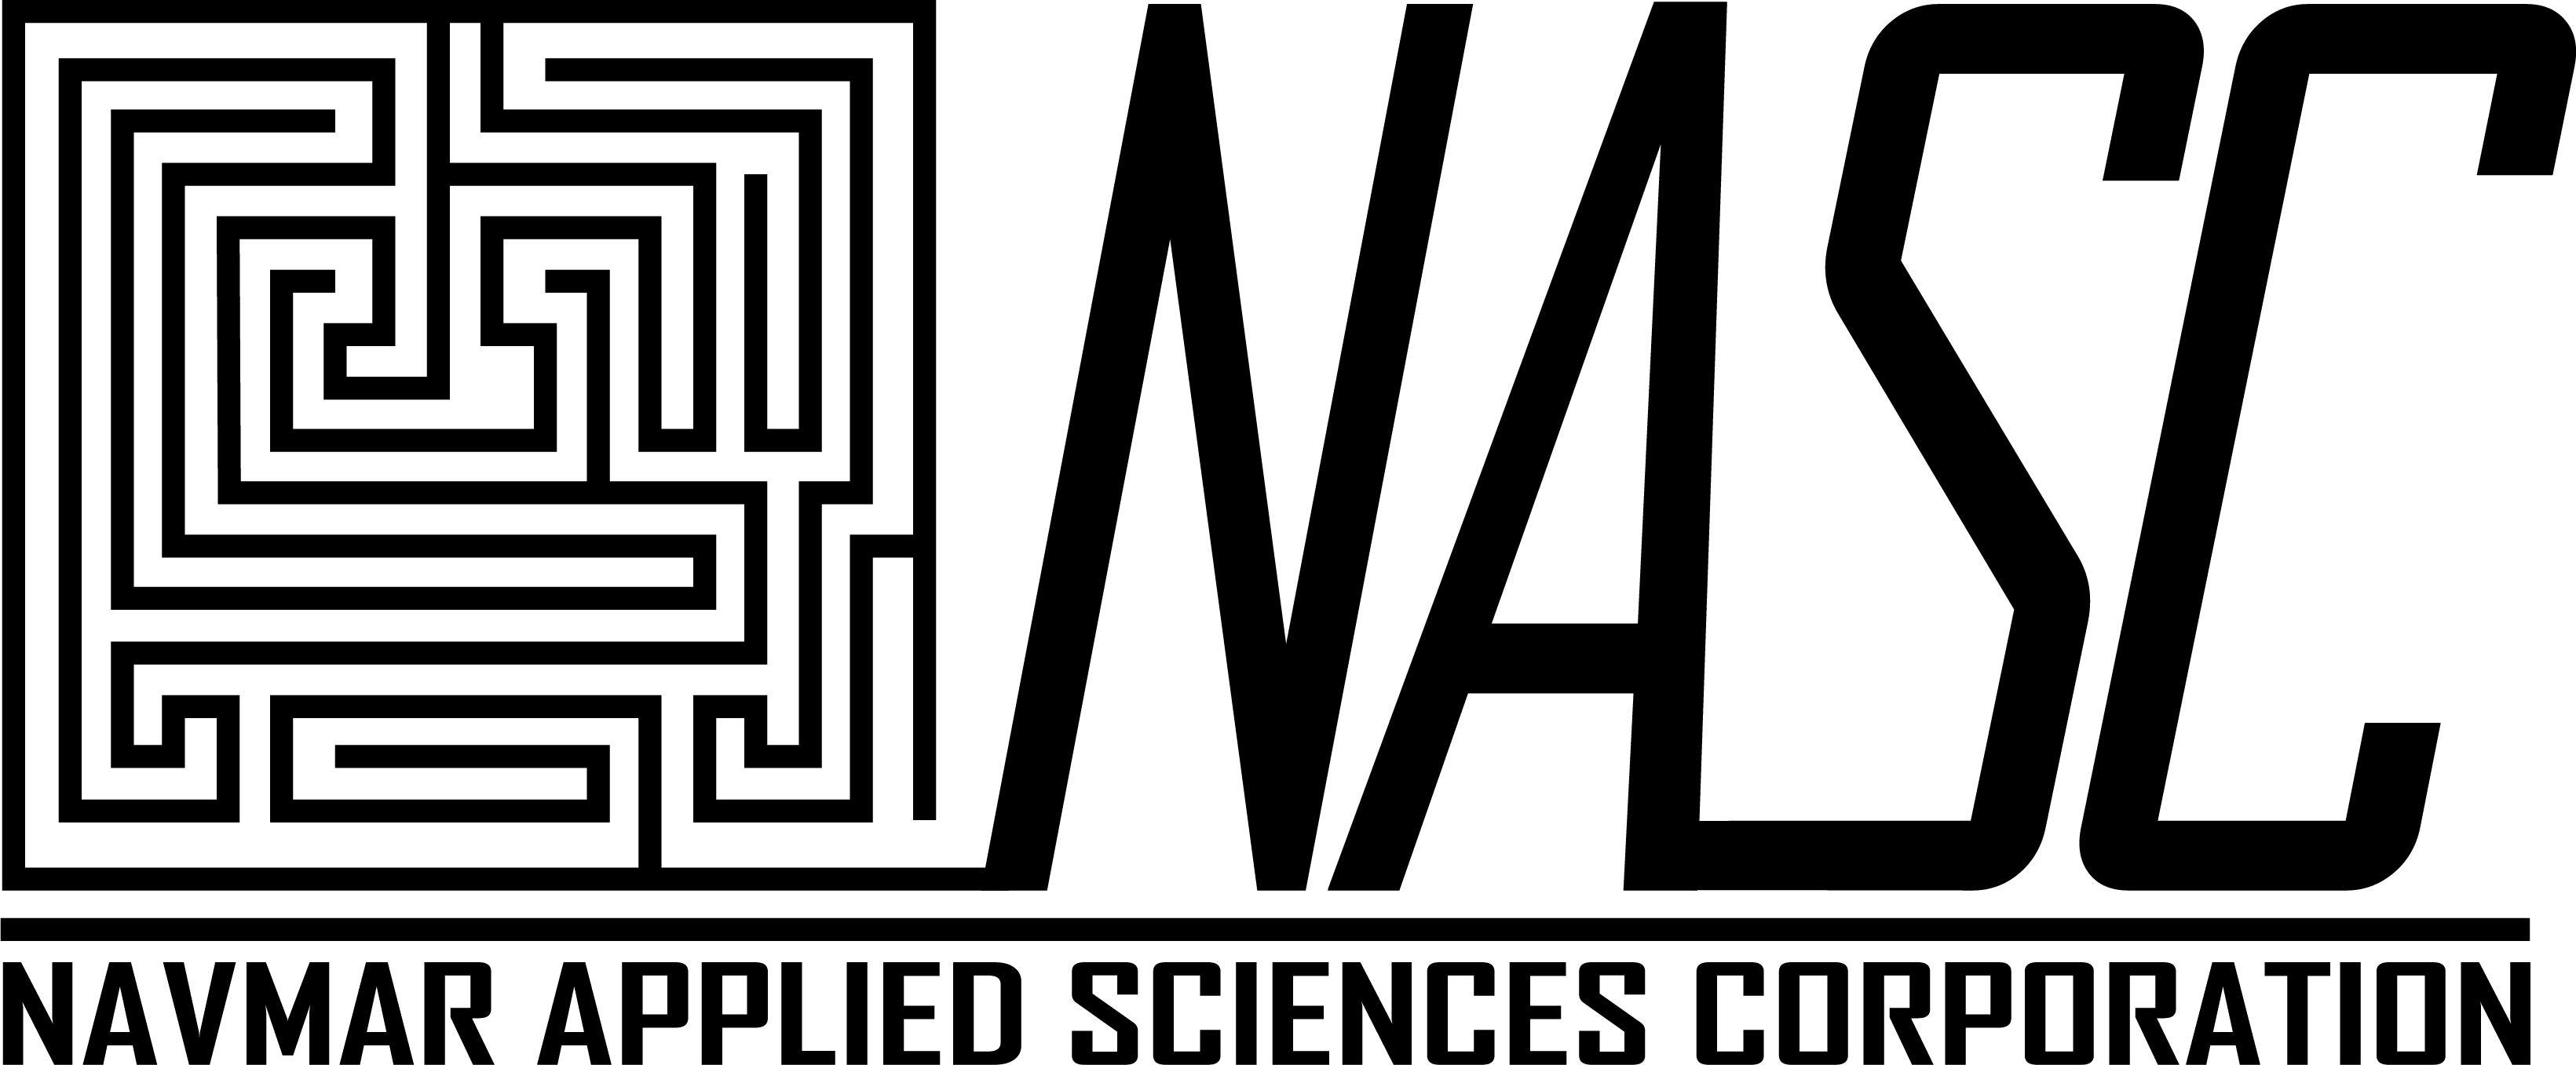 NASC_logo-Navmar_black